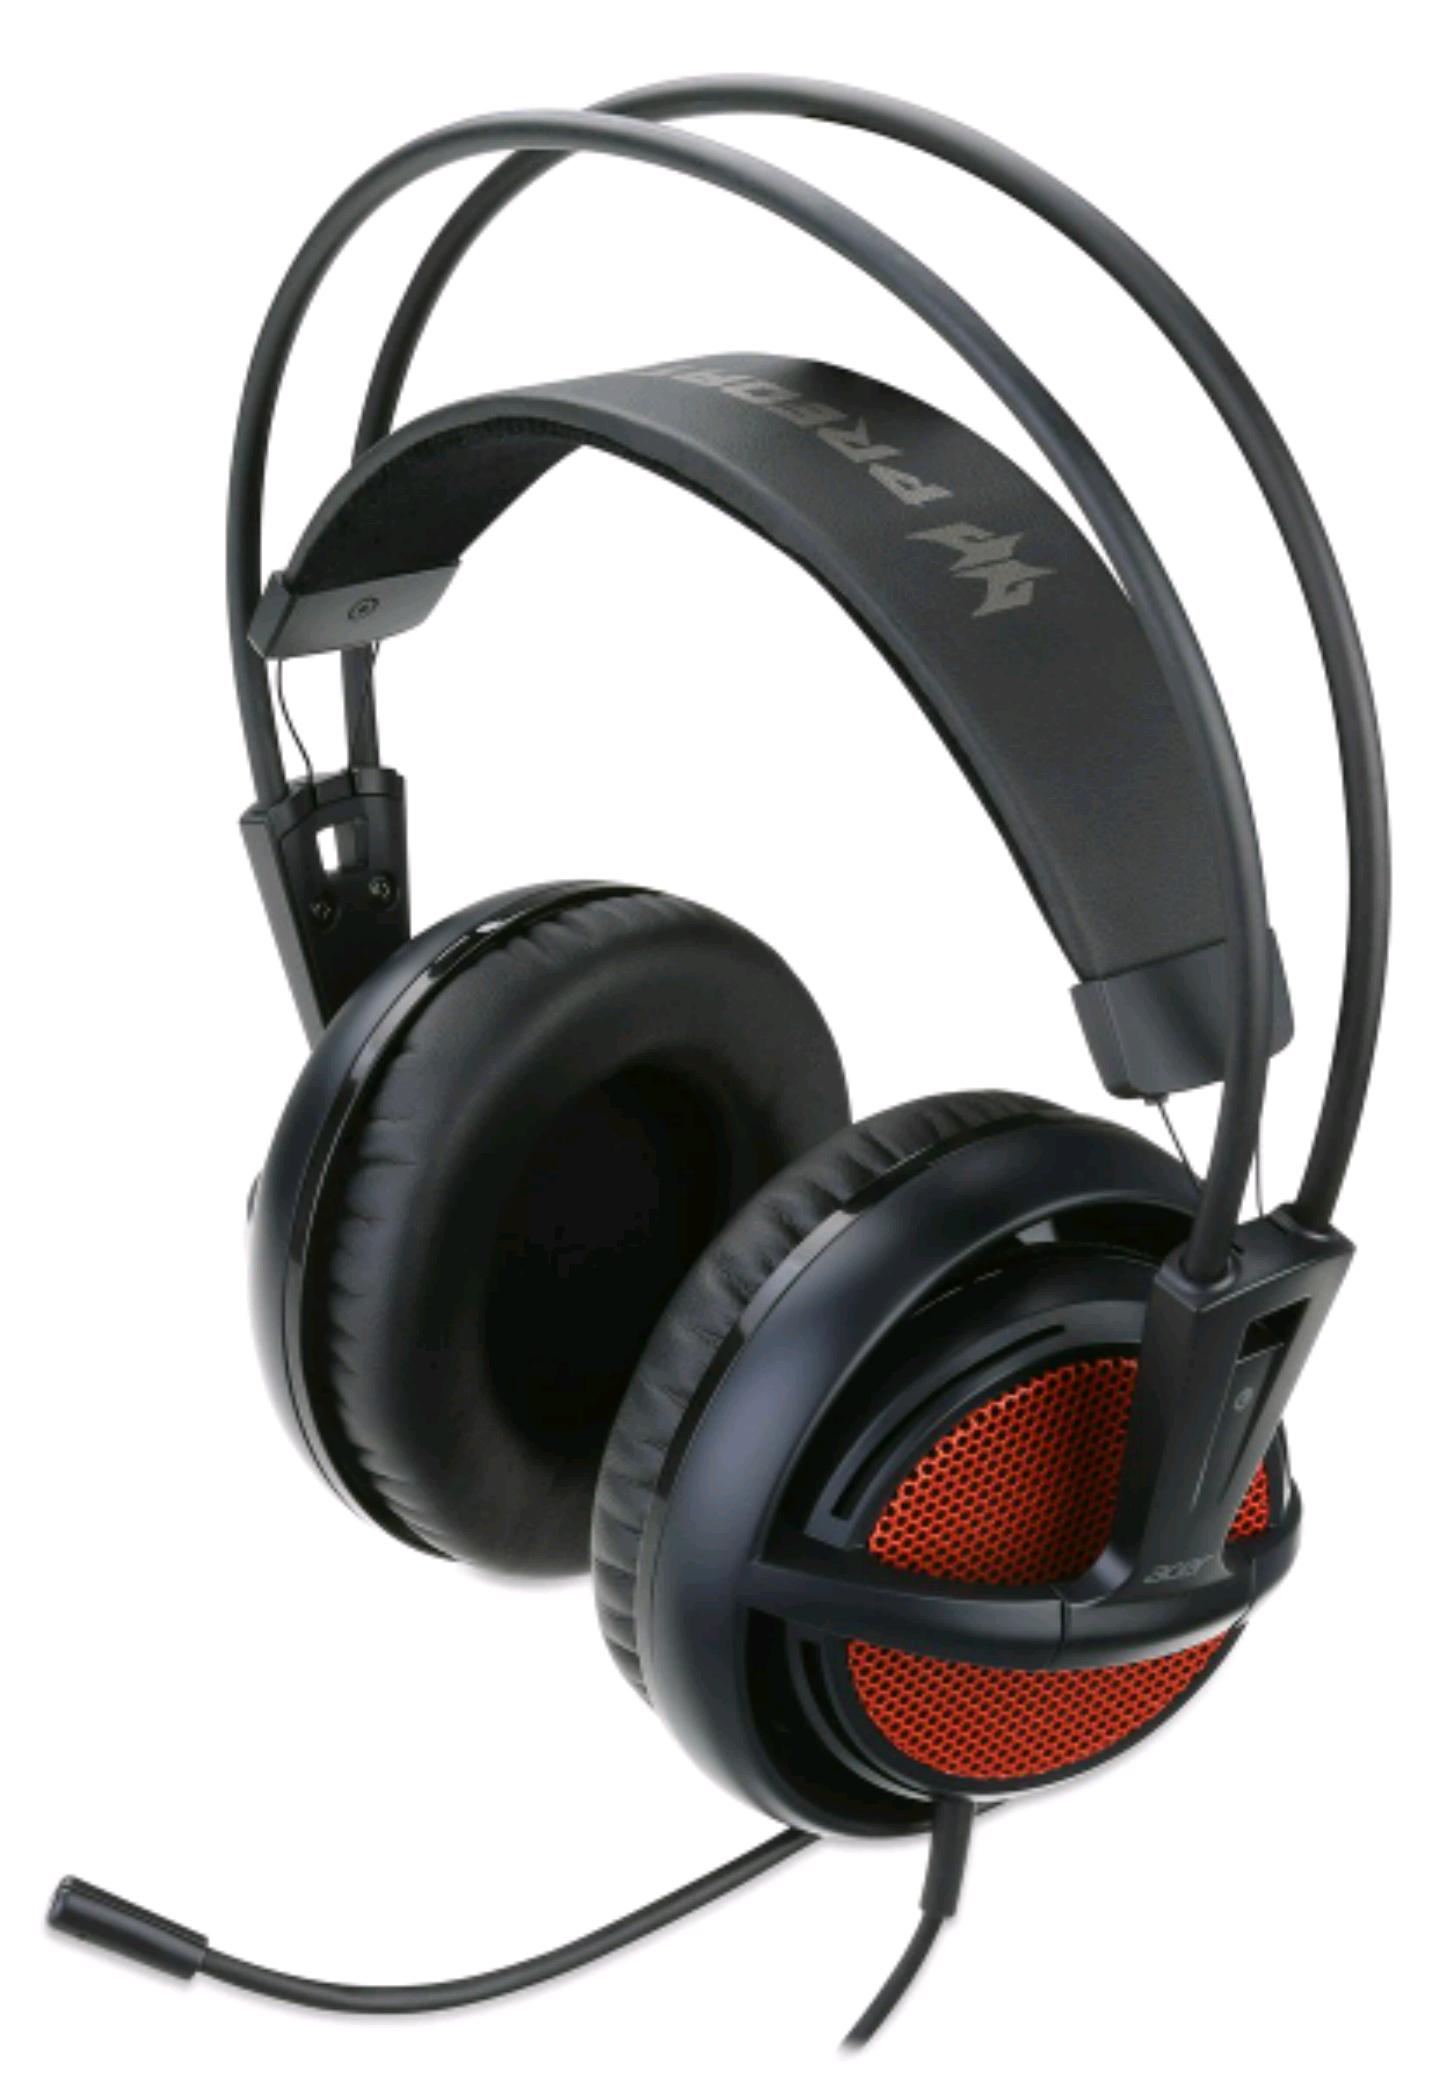 Acer predator gaming headset black red voor €39,99 @ Bol.com / Mediamarkt